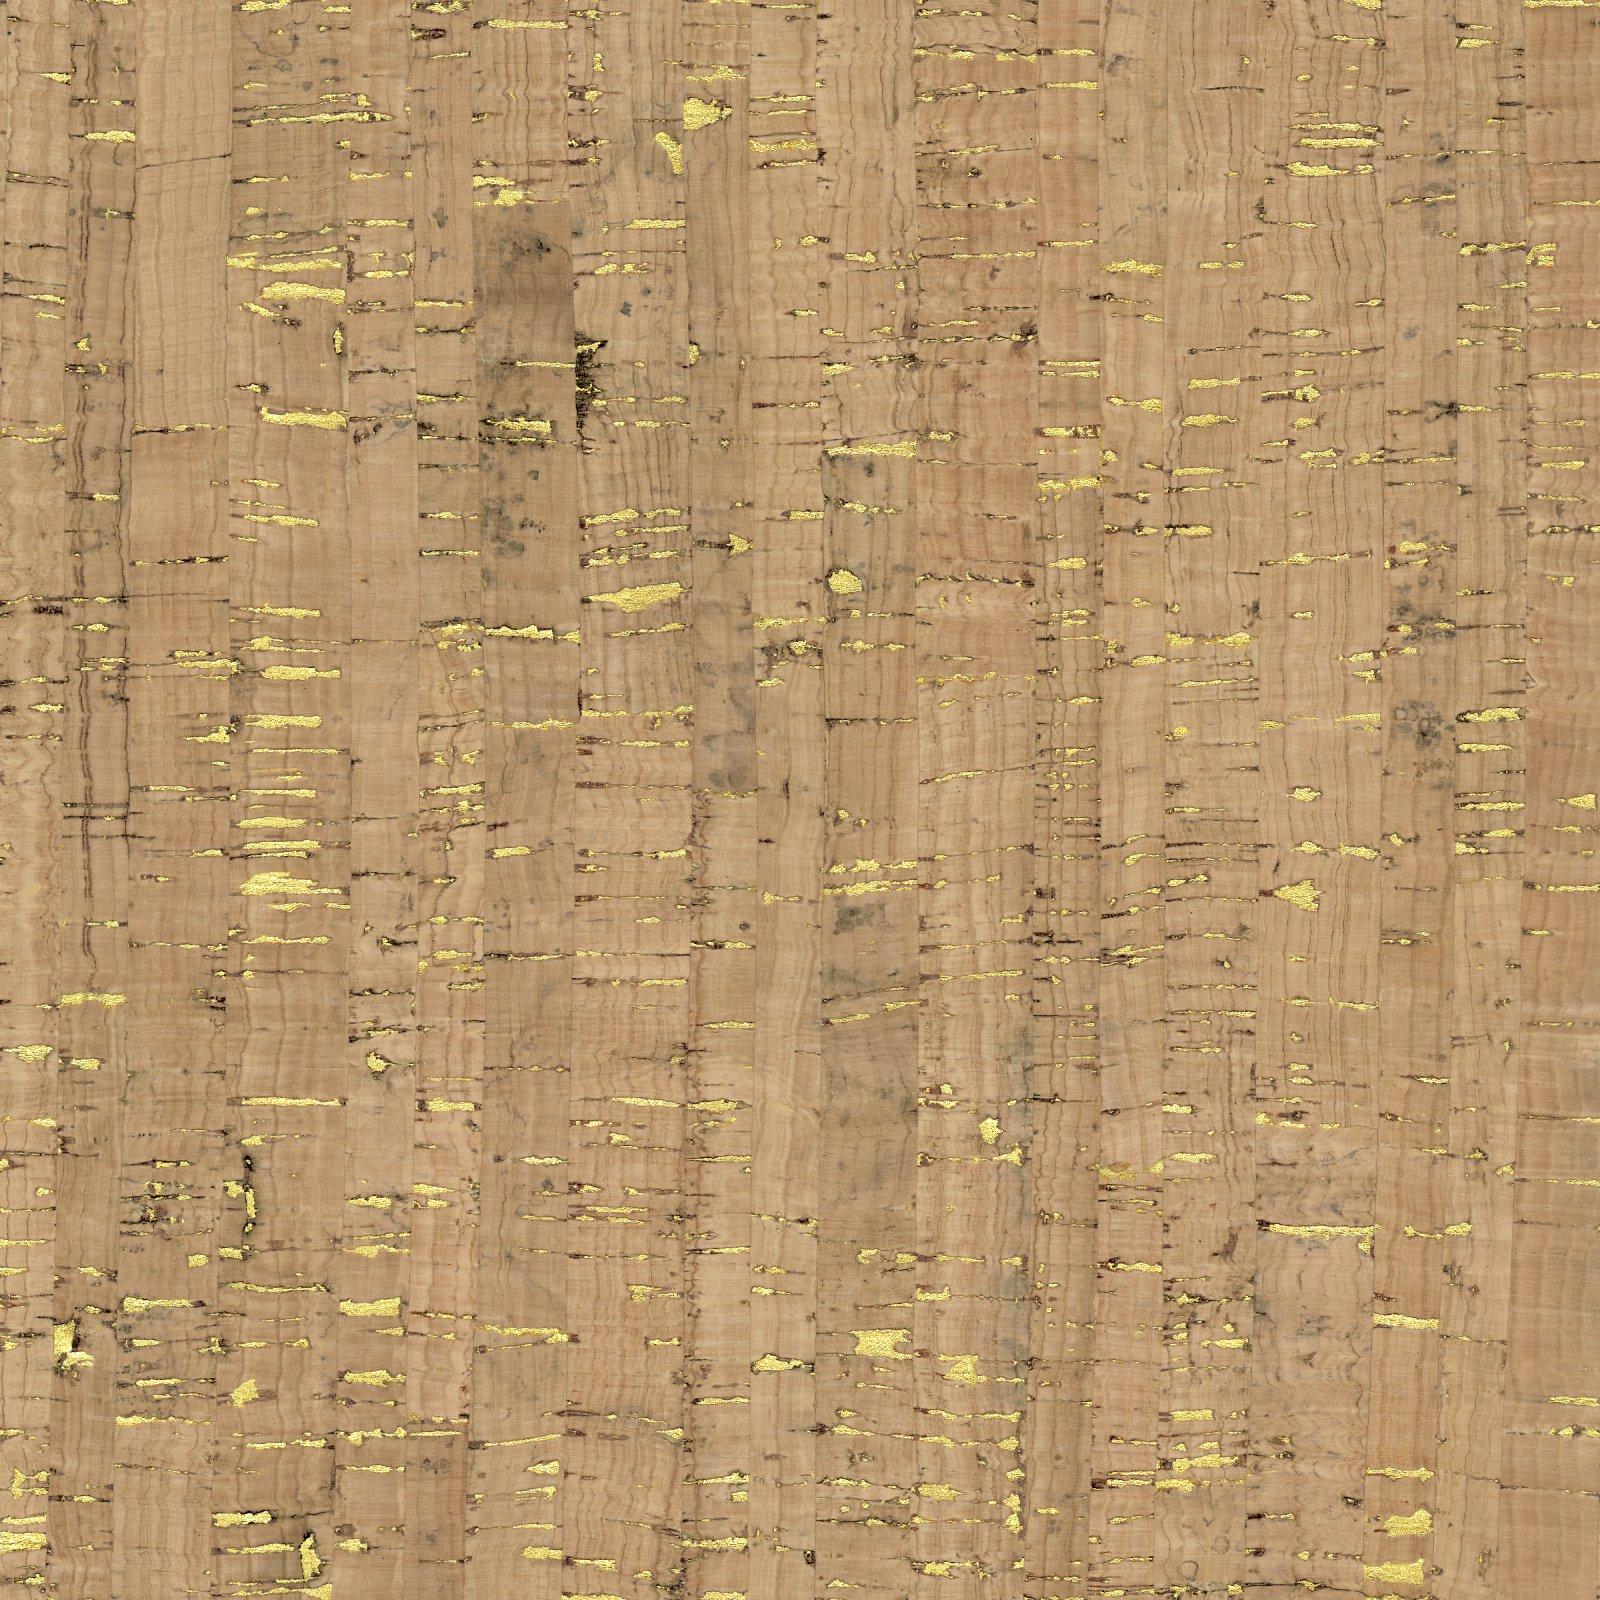 Natural Cork Fabric 18x52 - w/ Gold Flecks